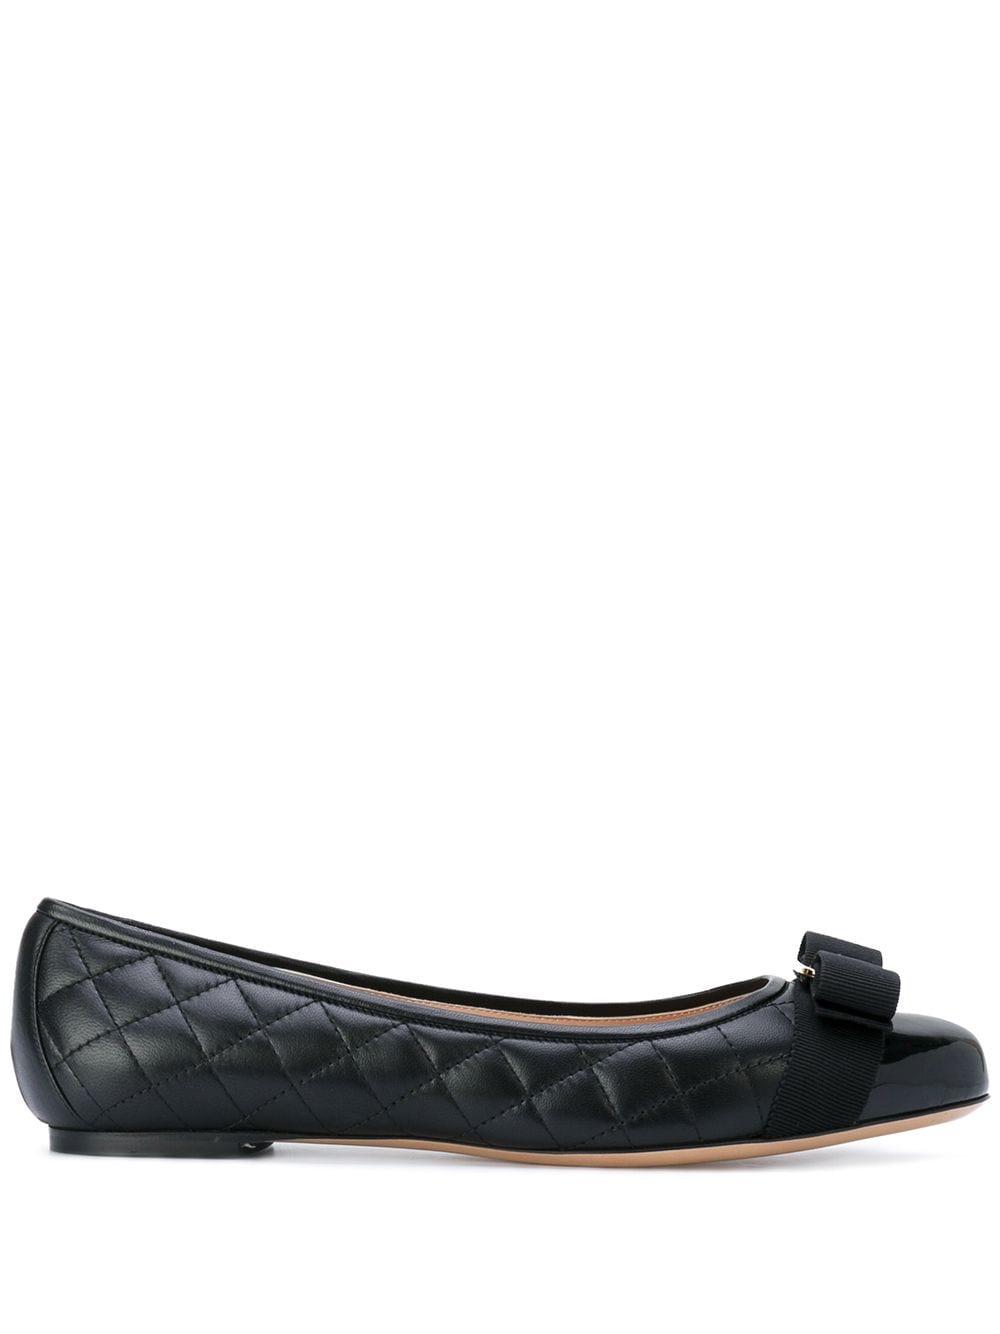 Varina Q* Leather Ballets